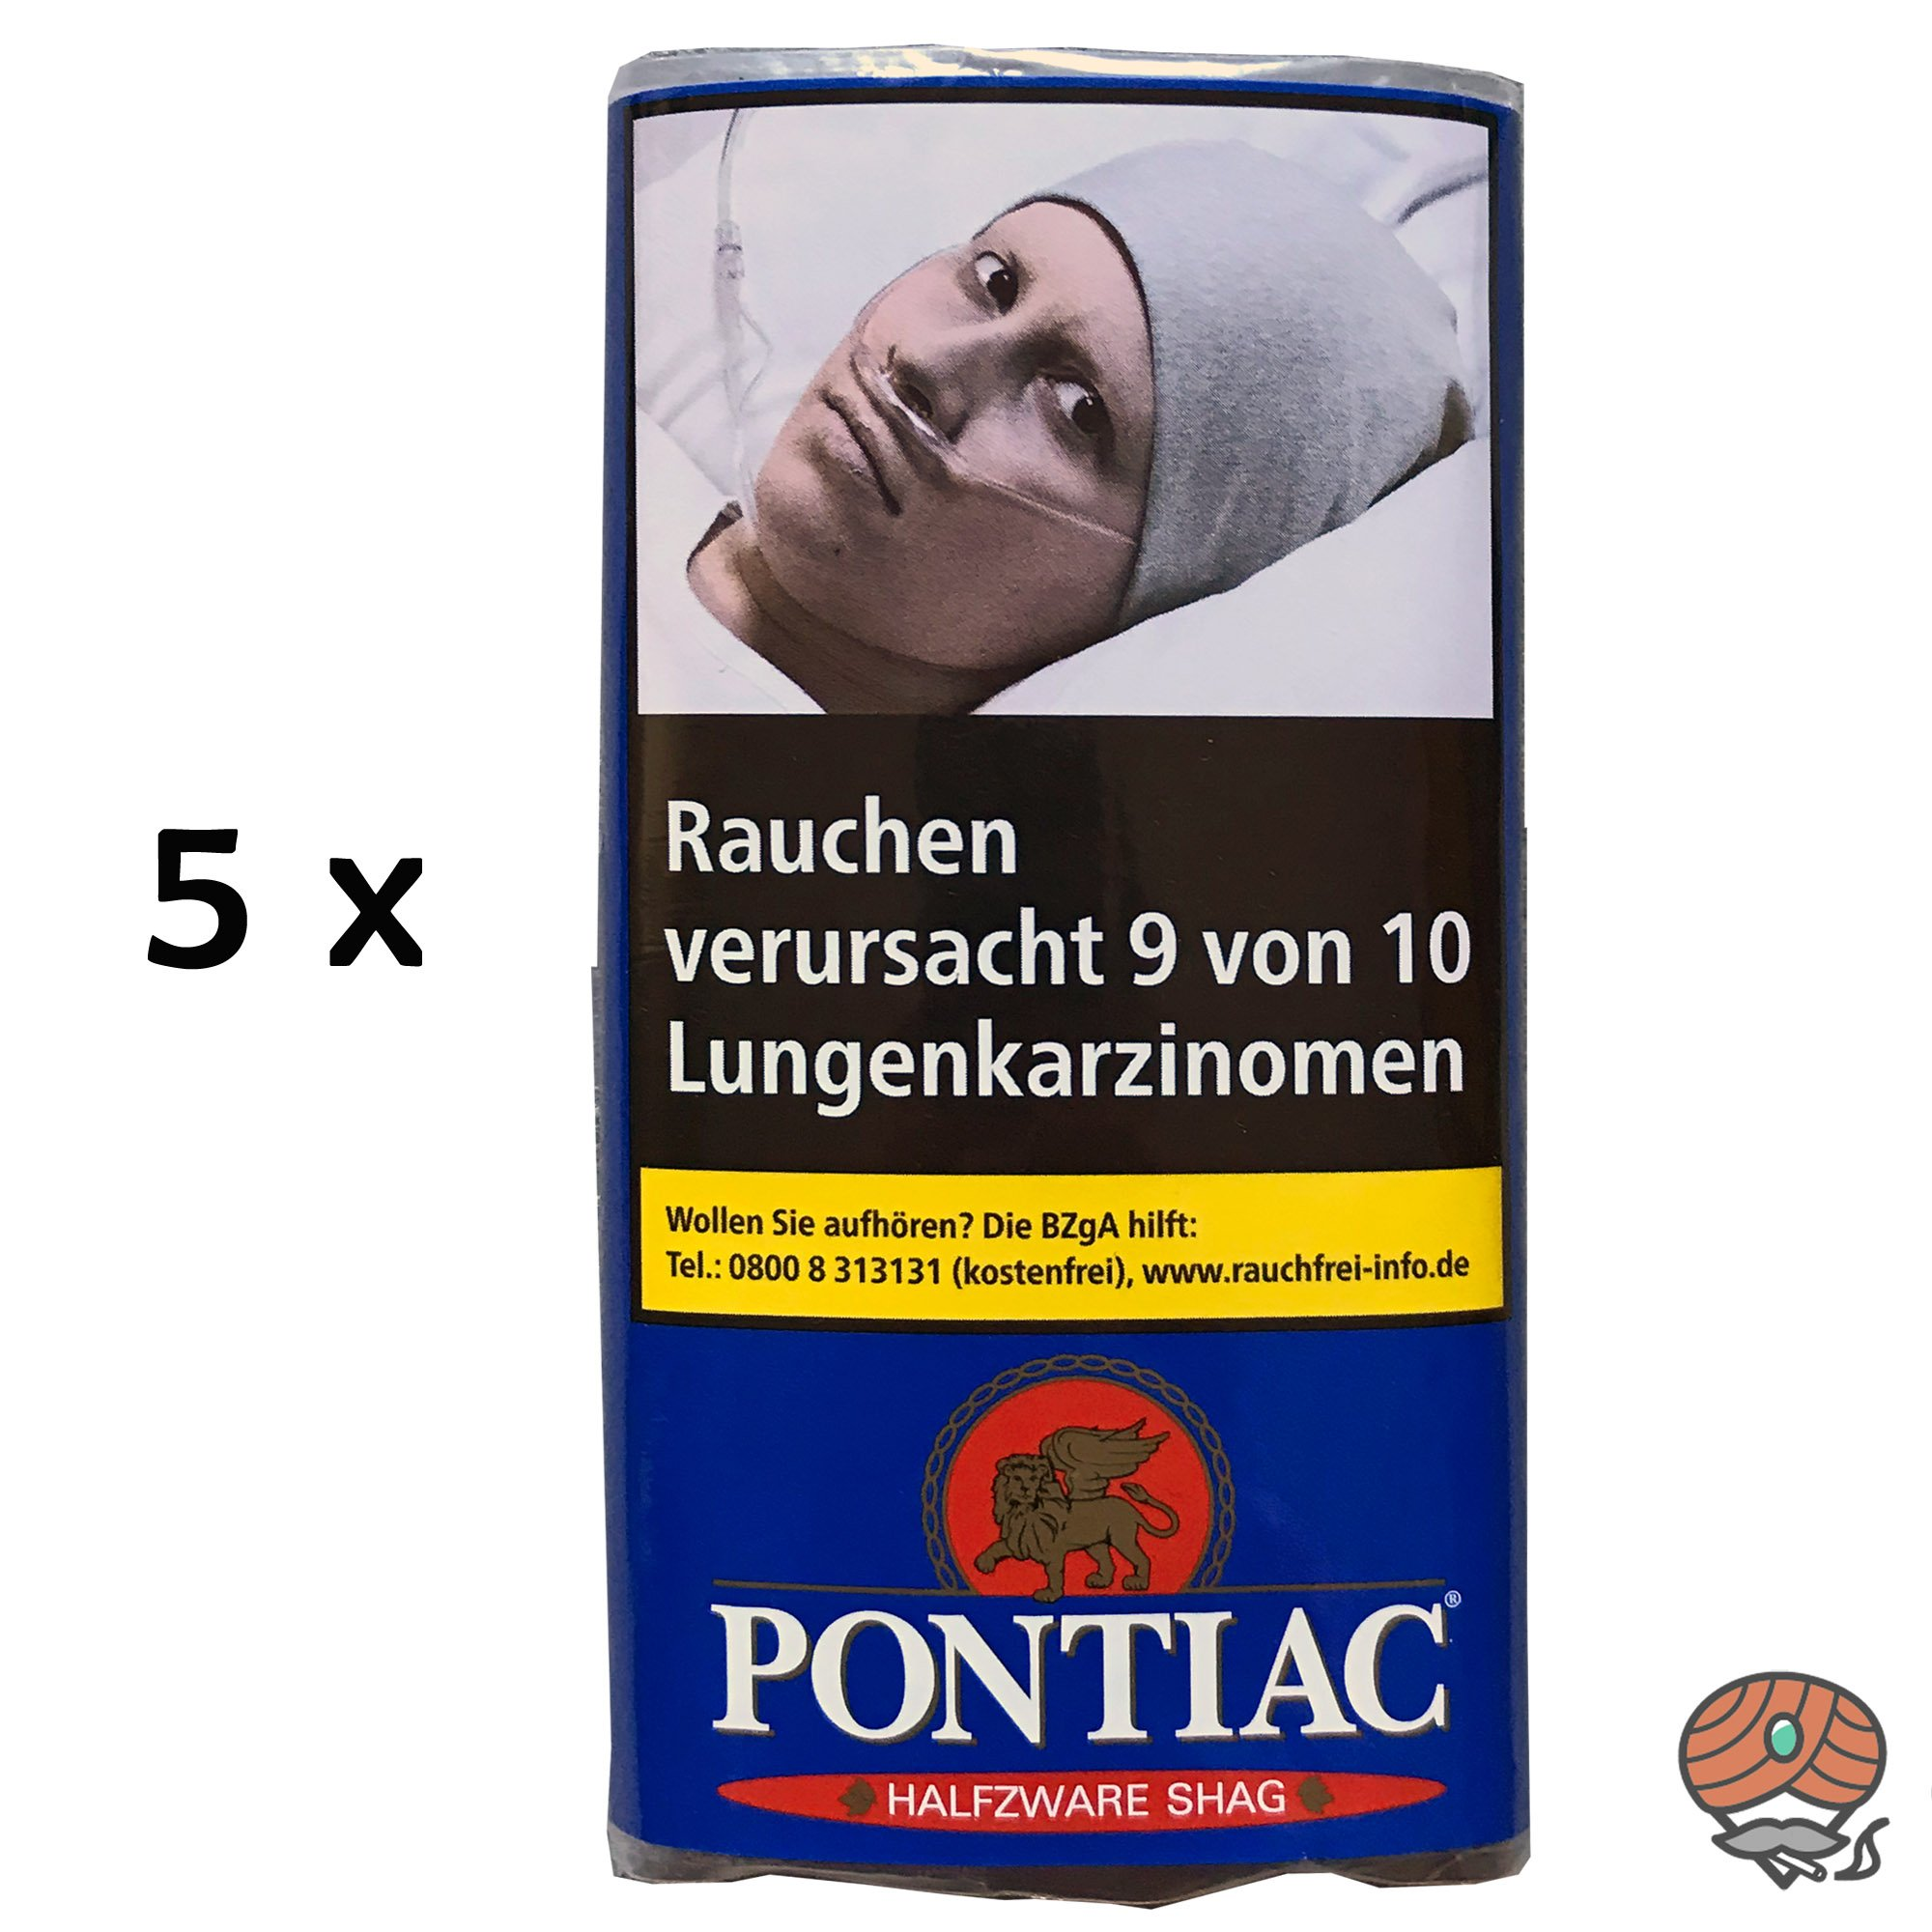 5x Pontiac Half-Zware Shag 30 g Zigarettentabak